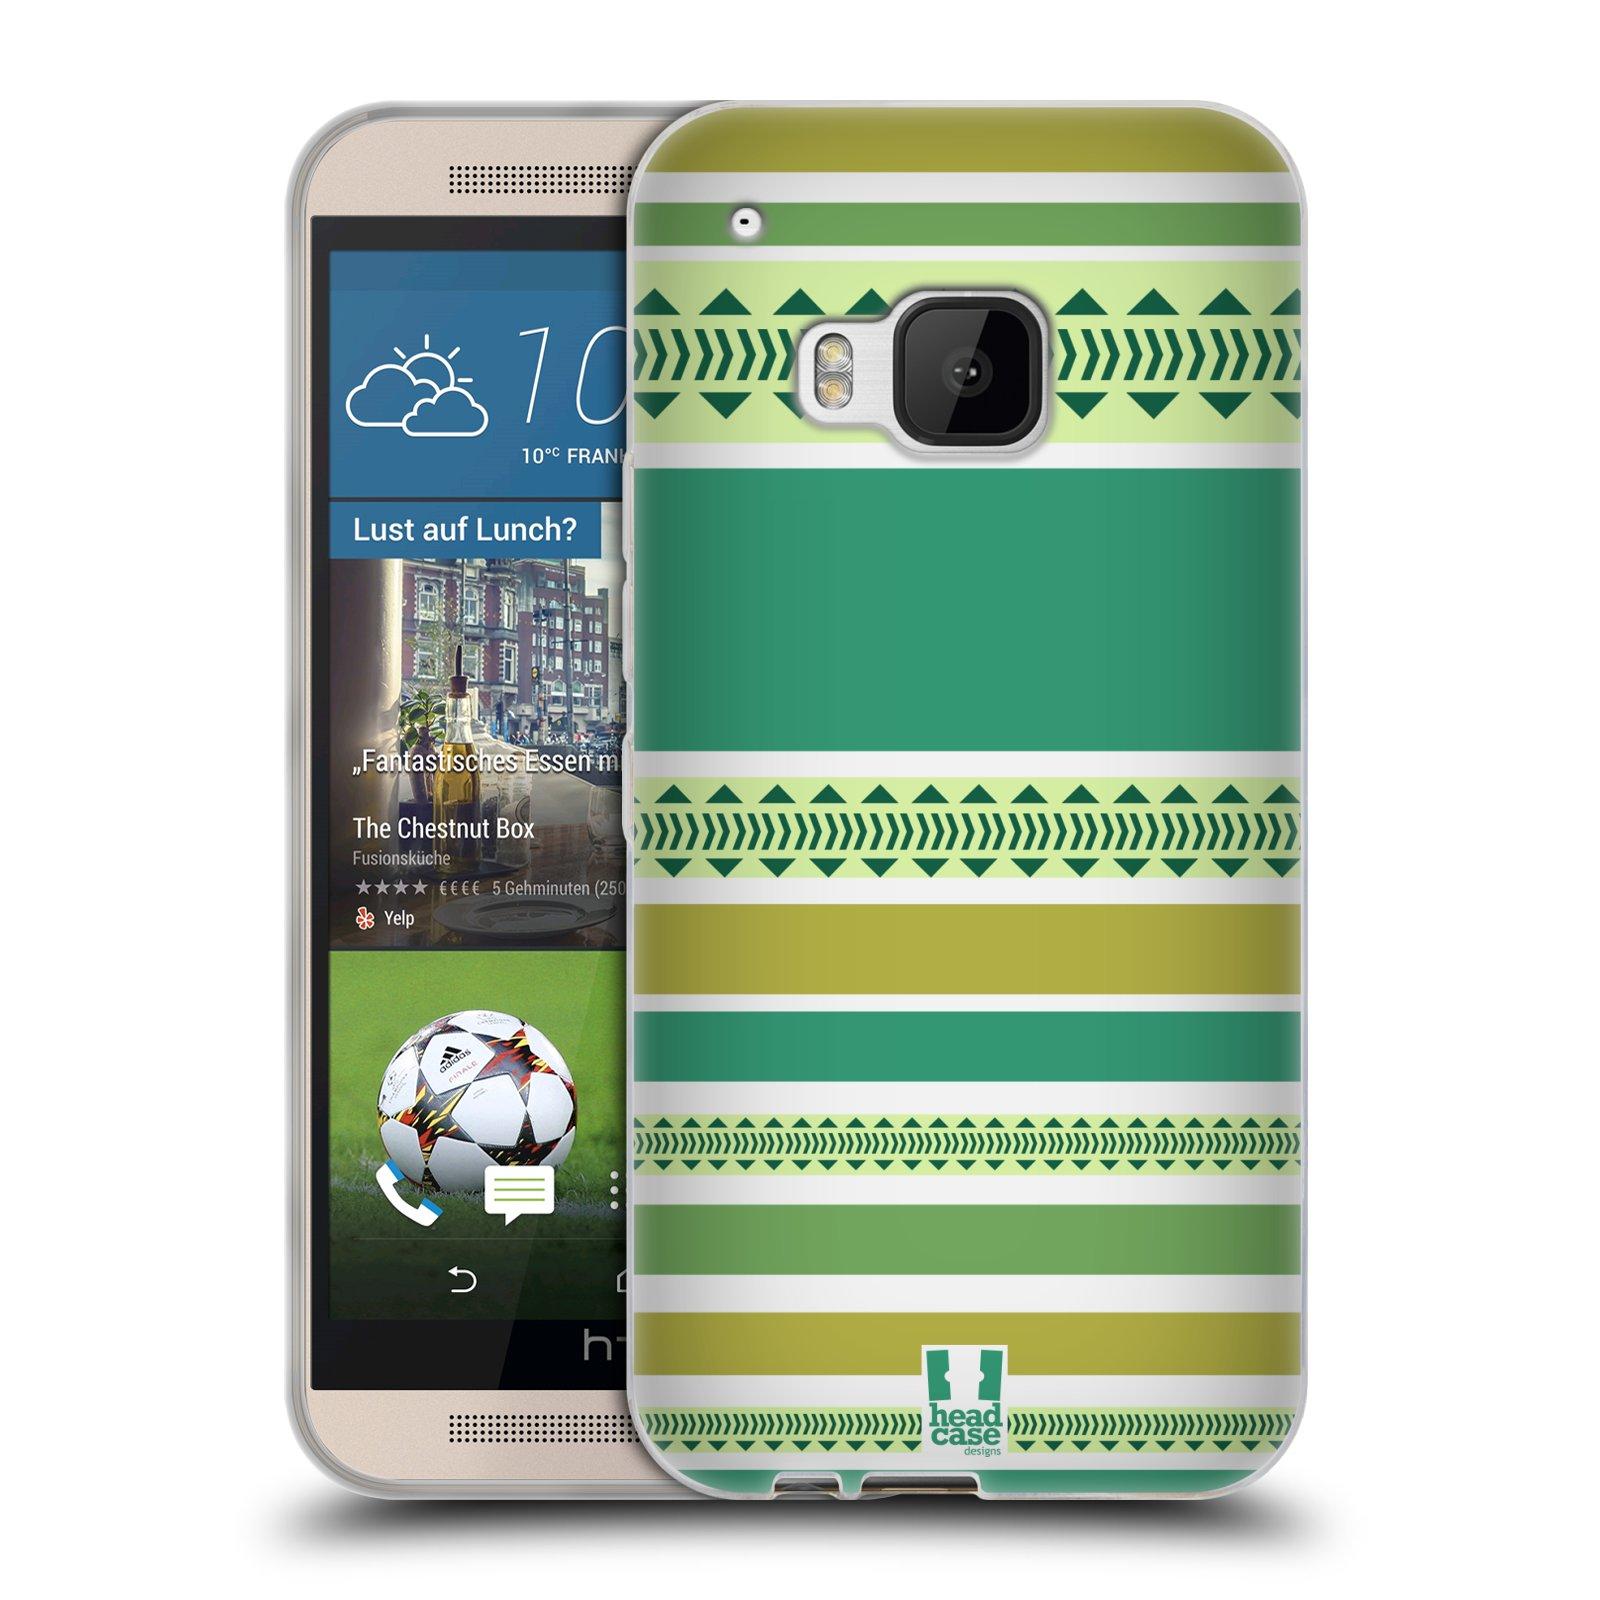 HEAD CASE DESIGNS PRINTED STRIPES SOFT GEL CASE FOR HTC PHONES 1